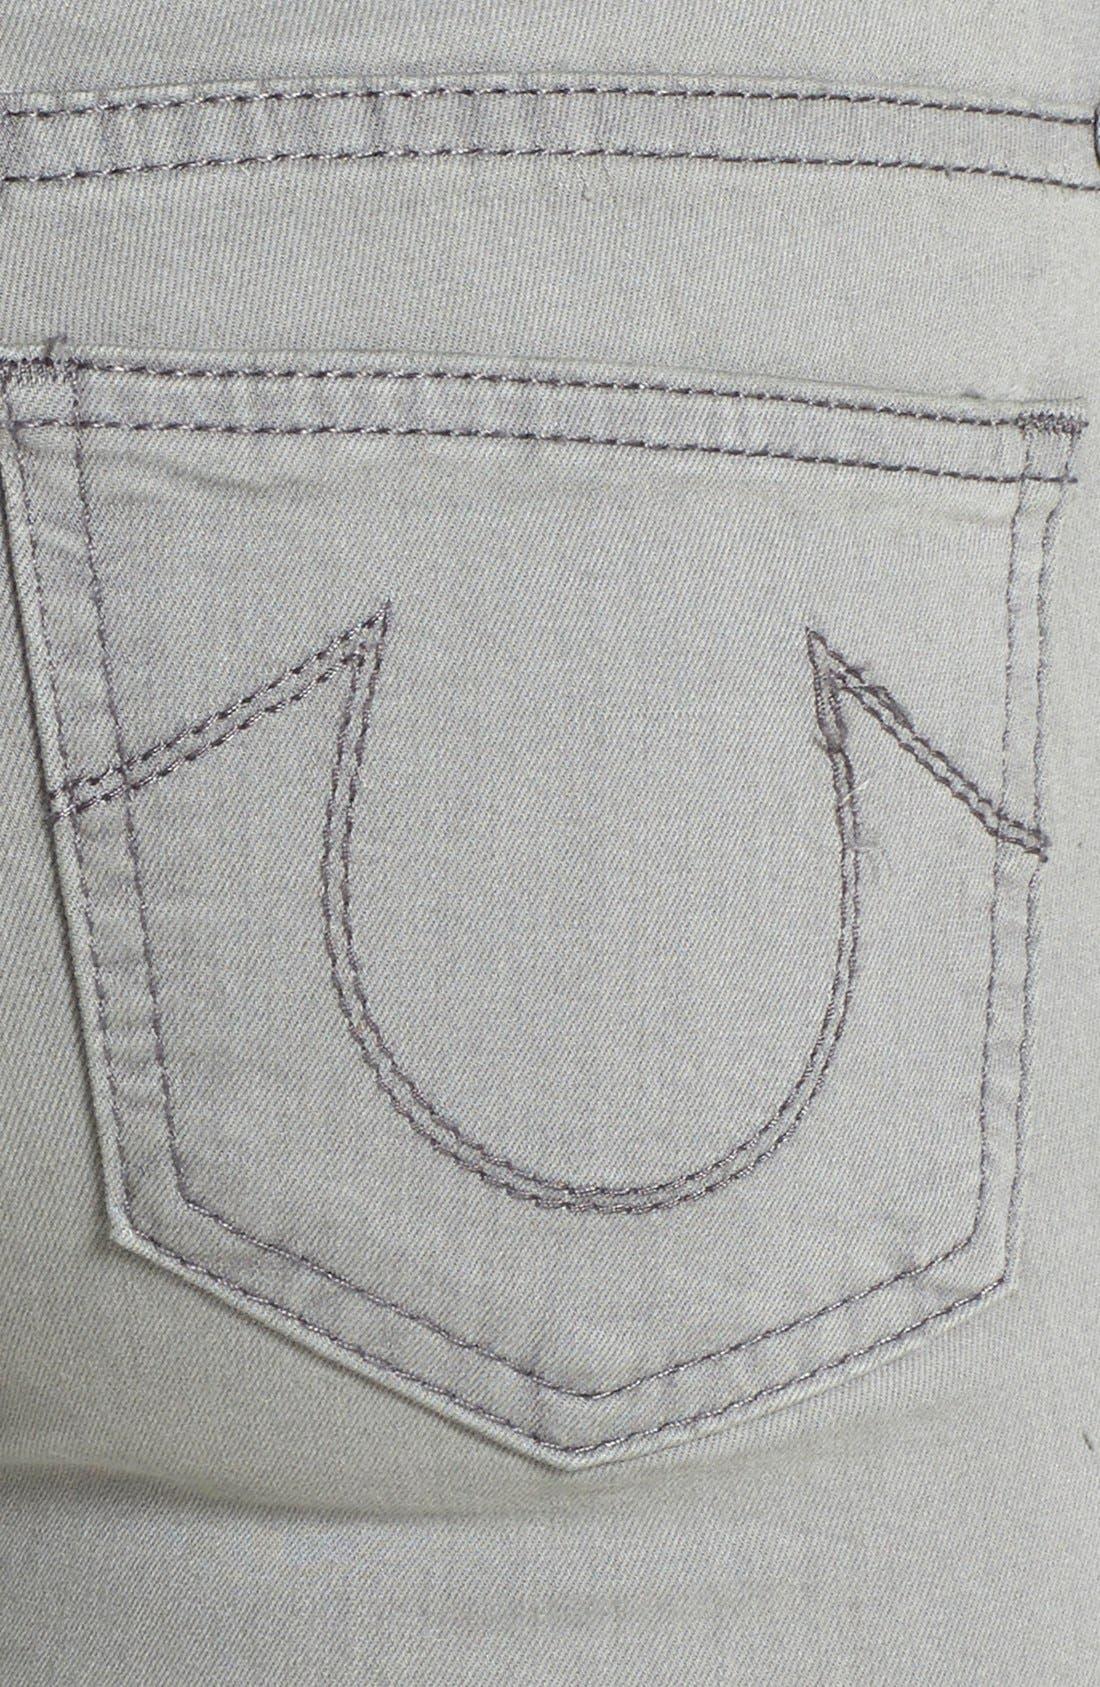 Alternate Image 3  - True Religion Brand Jeans 'Halle' Skinny Jeans (Protester's Song)